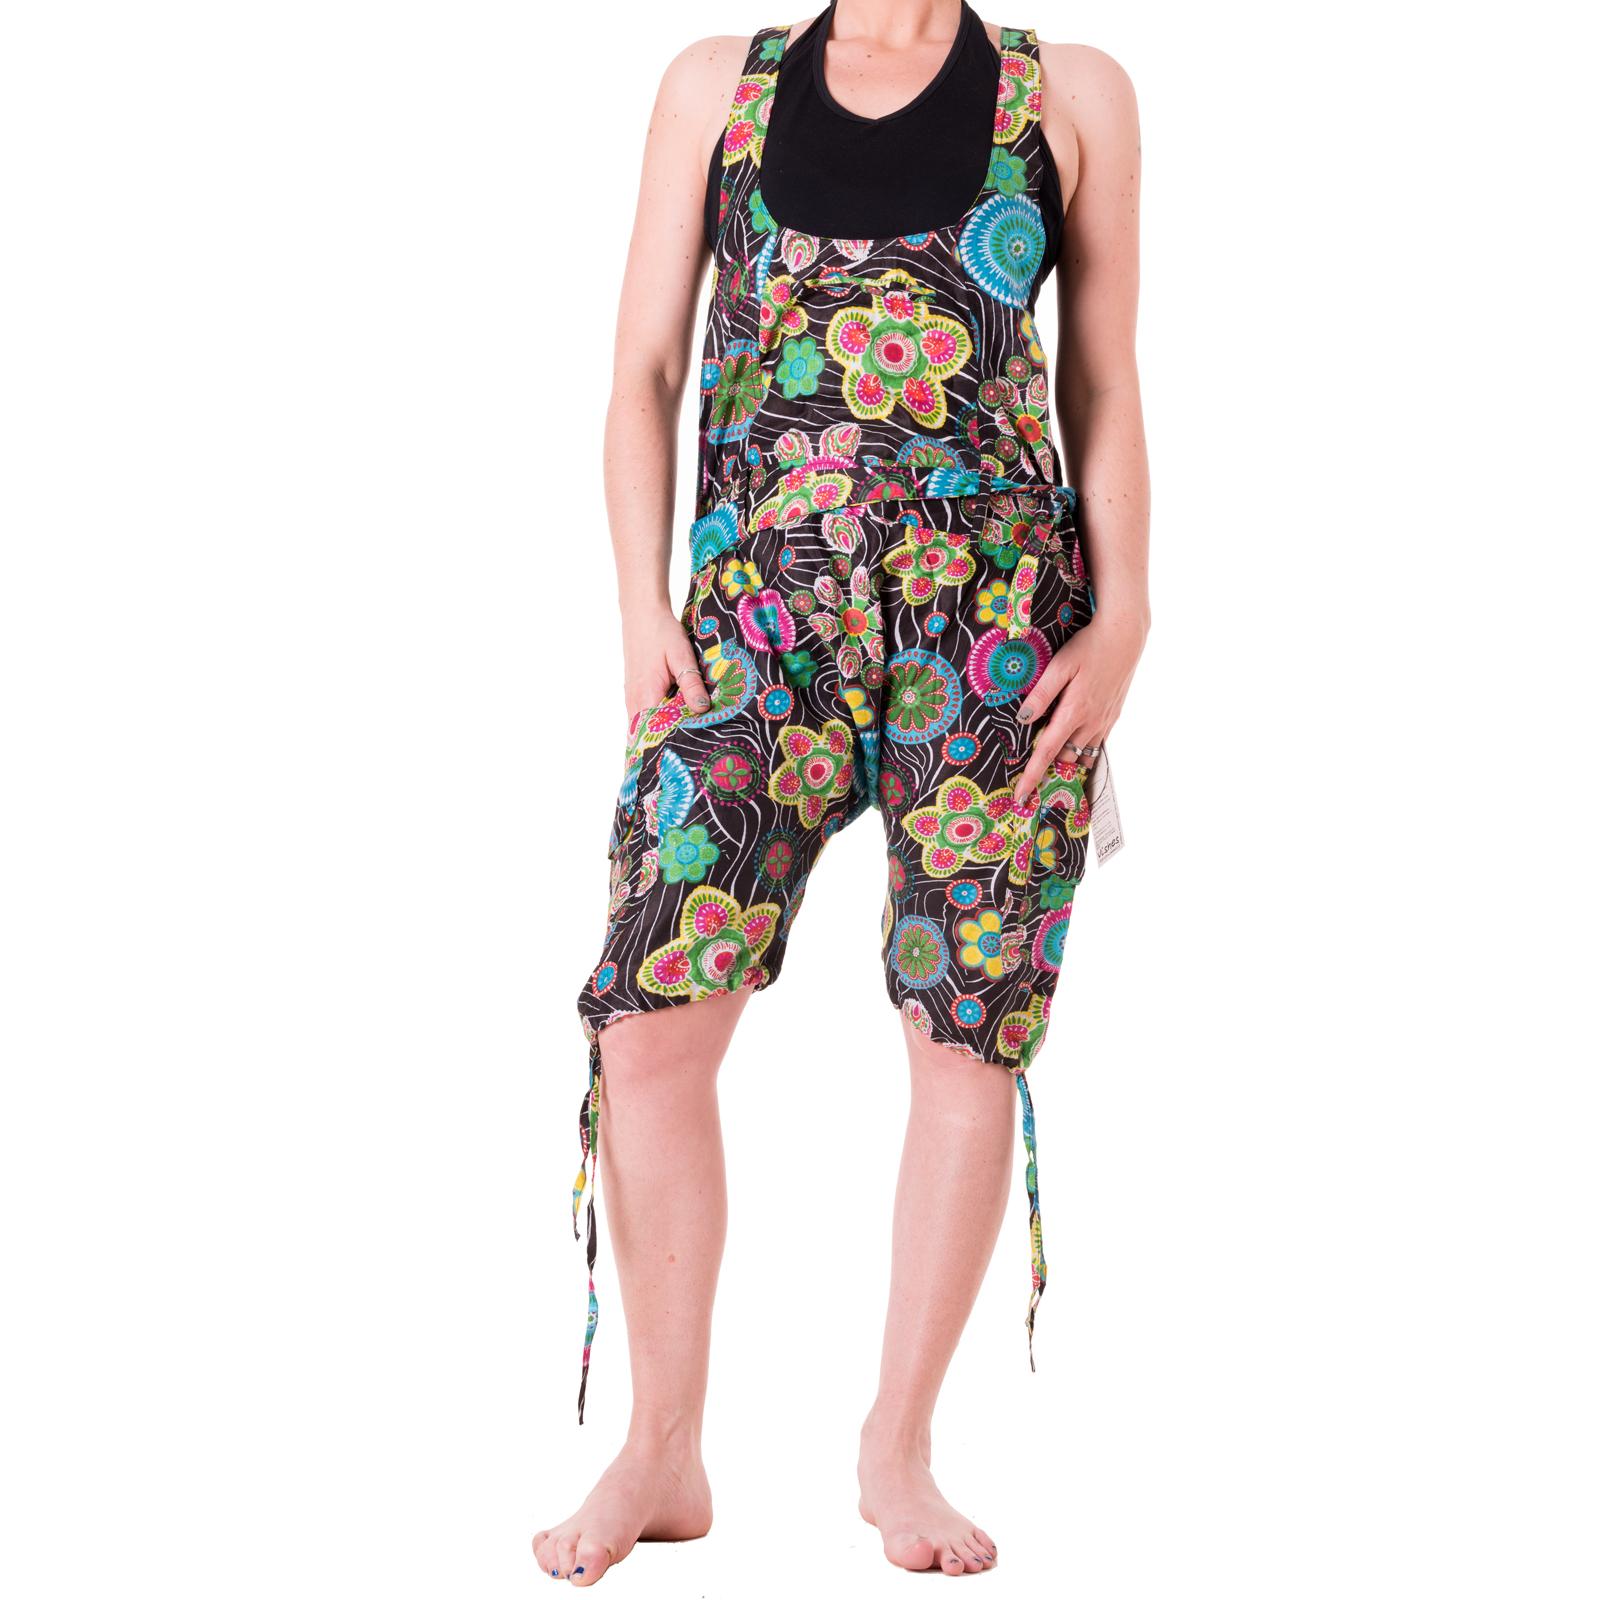 vishes bunte kurze latzhose hippie ethno flower power goa hose sommerhose blumen ebay. Black Bedroom Furniture Sets. Home Design Ideas